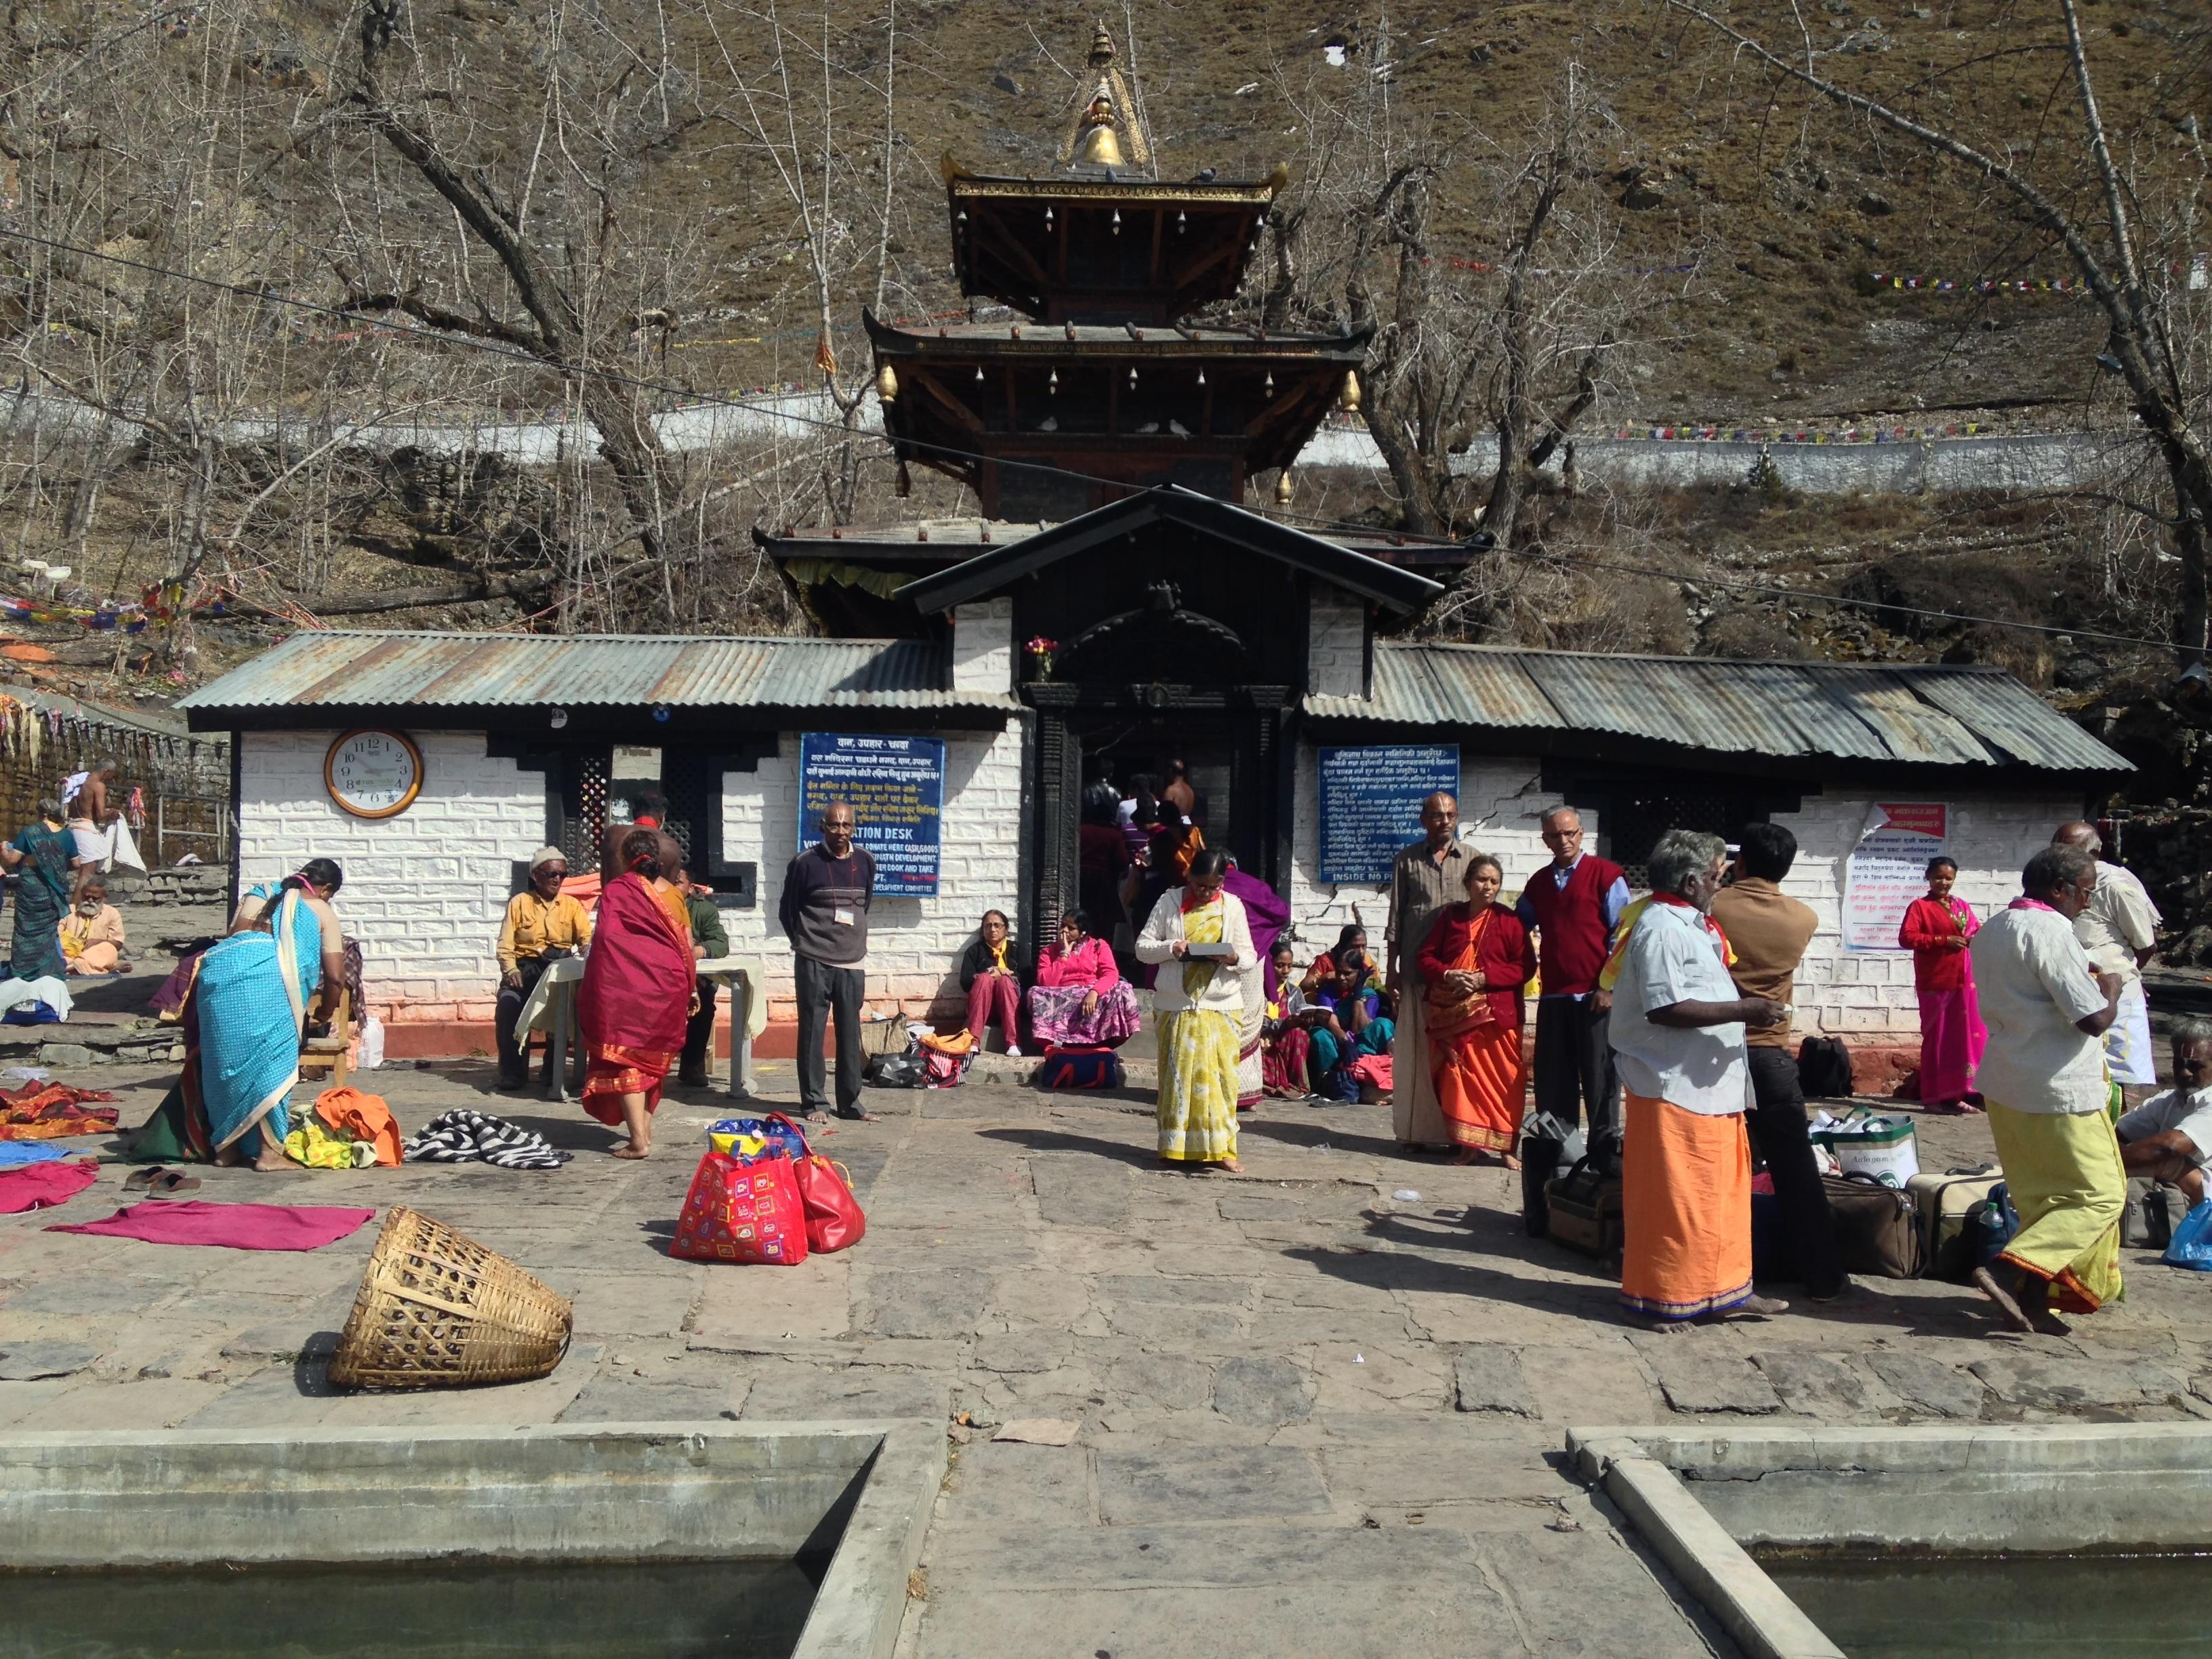 Hindu Pilgrimage Tour in Nepal- Muktinath Temple